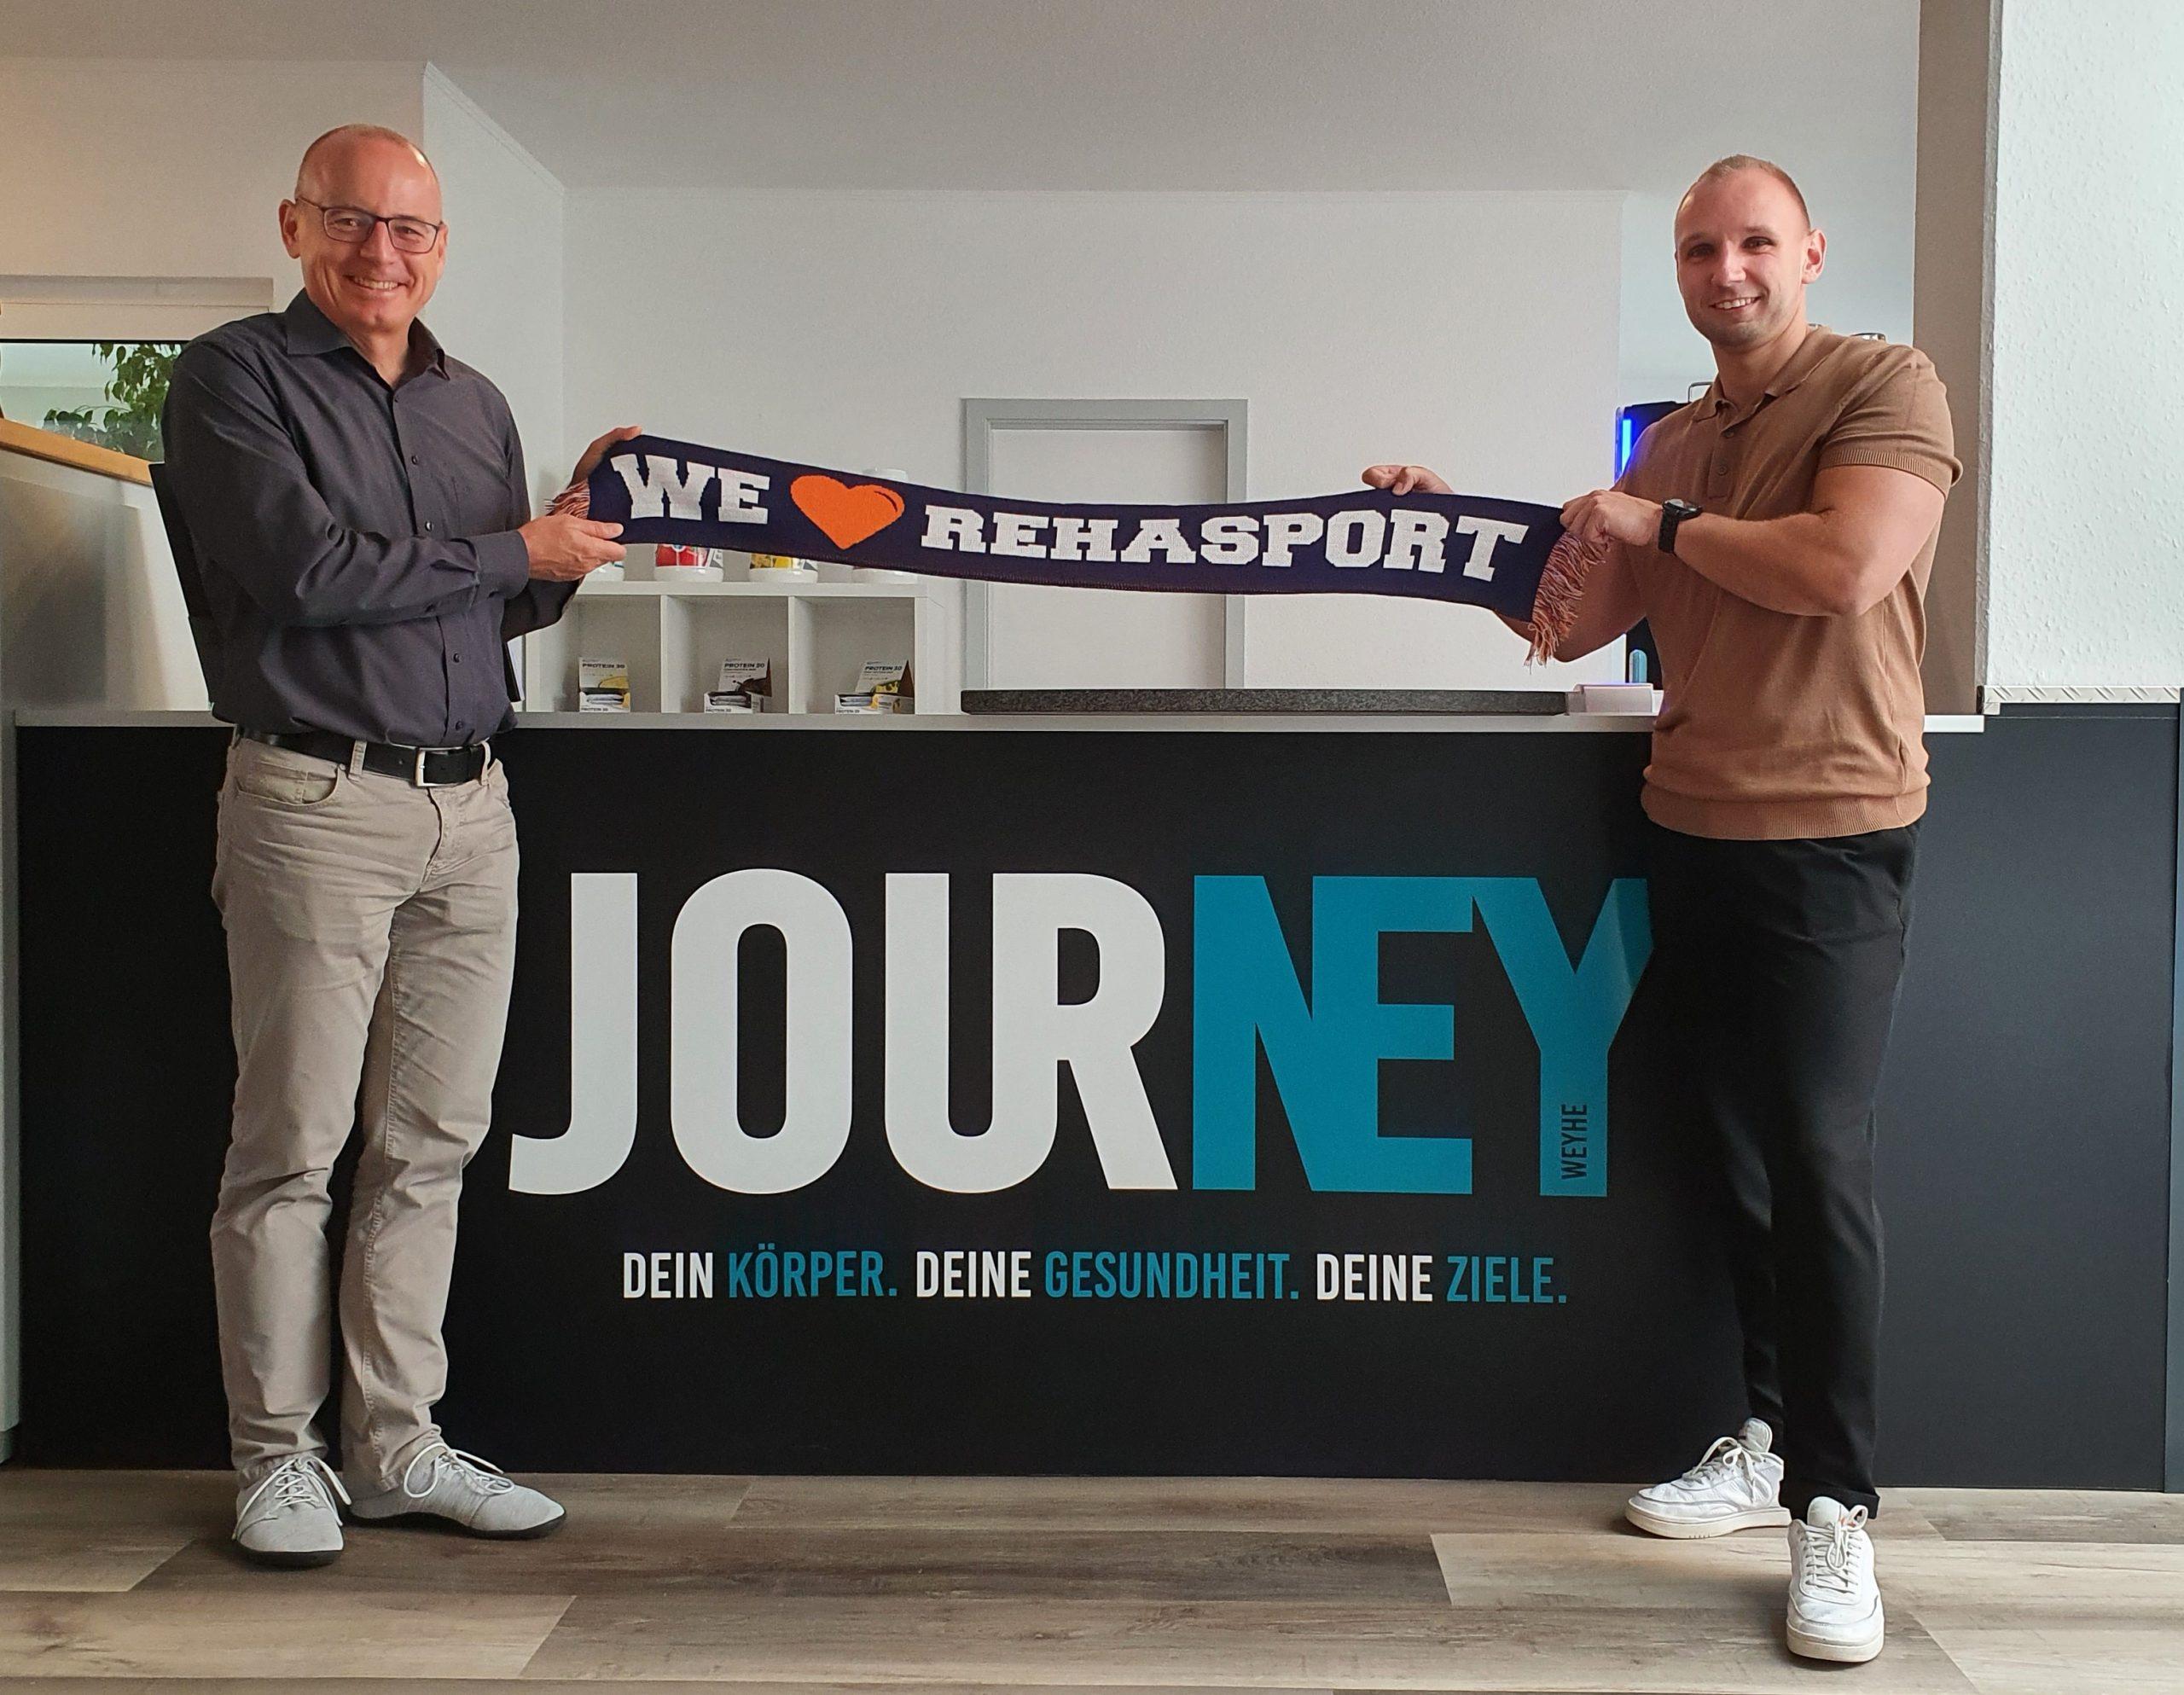 Rehasport in Weyhe - Journey Weyhe